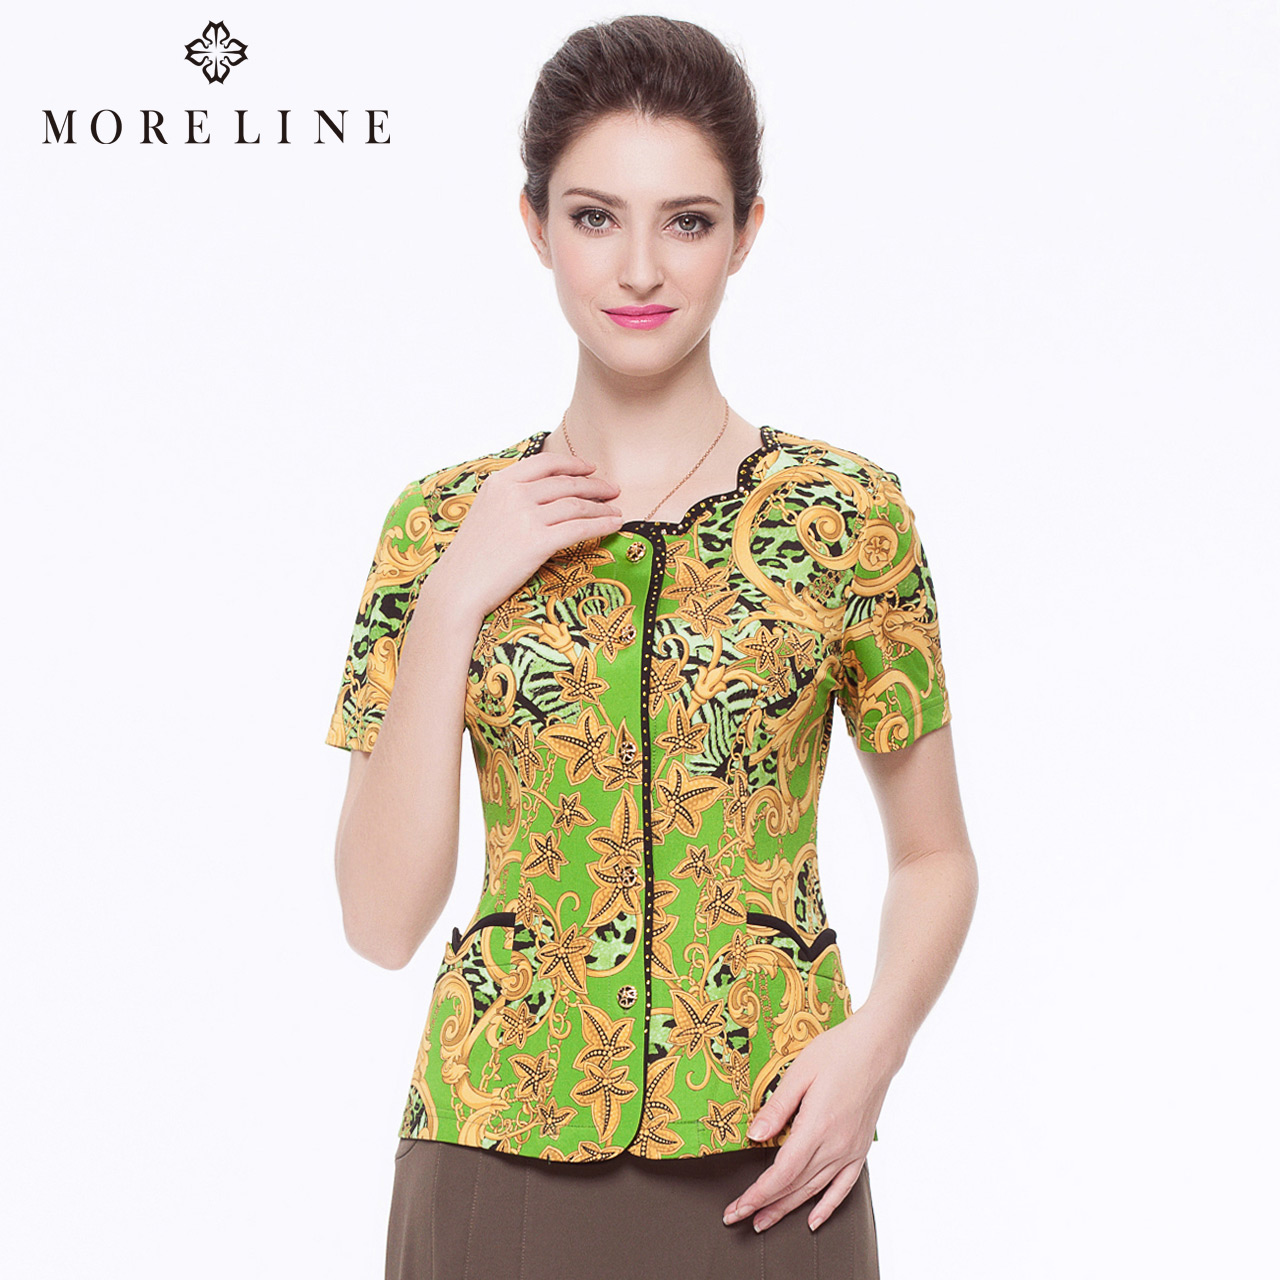 MORELINE沐兰品牌女装夏季通勤短袖修身显瘦印花衬衫6234502